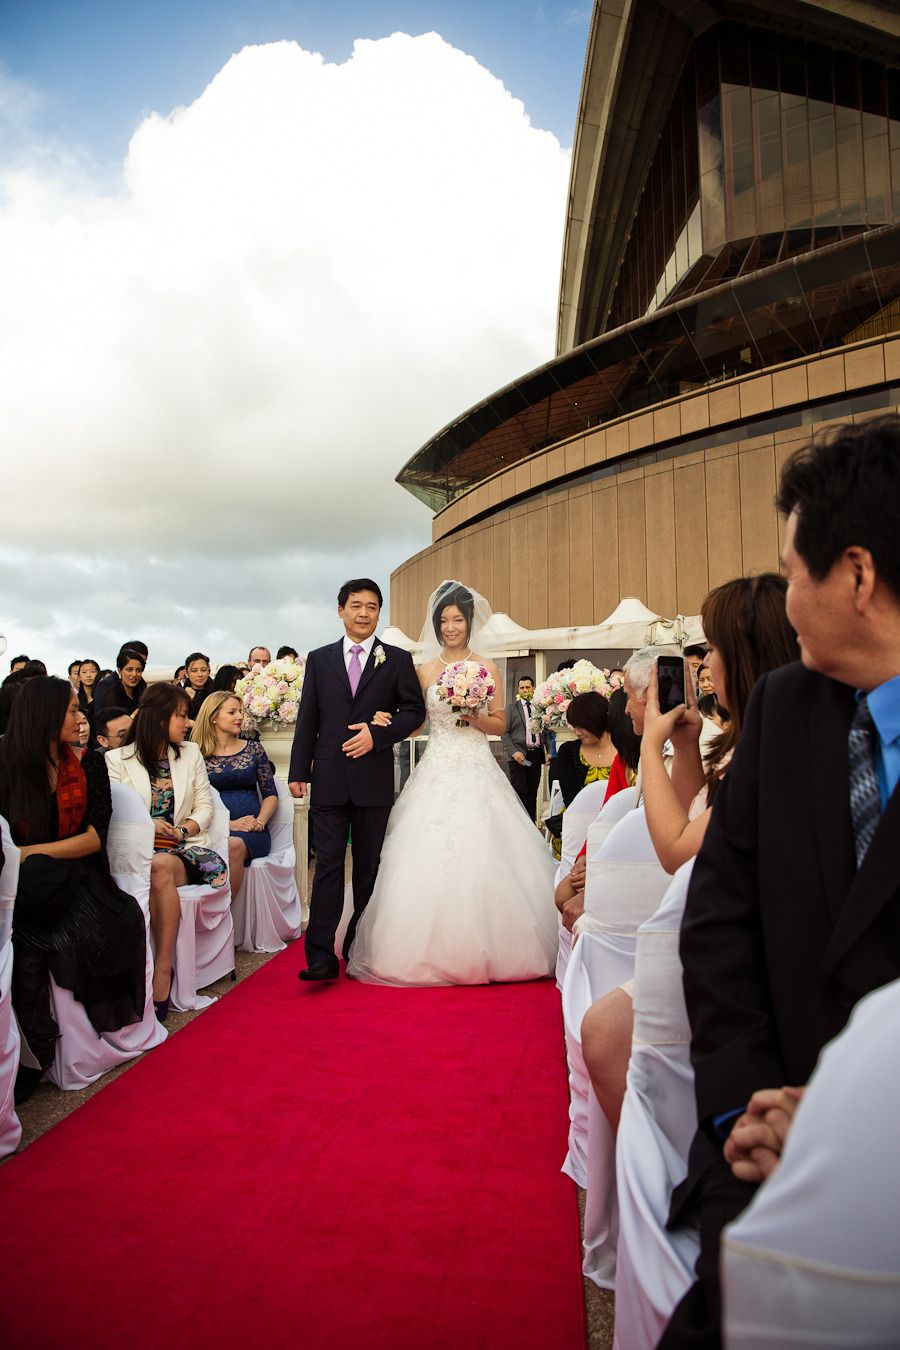 Dunbar House real wedding photography - gm photographics